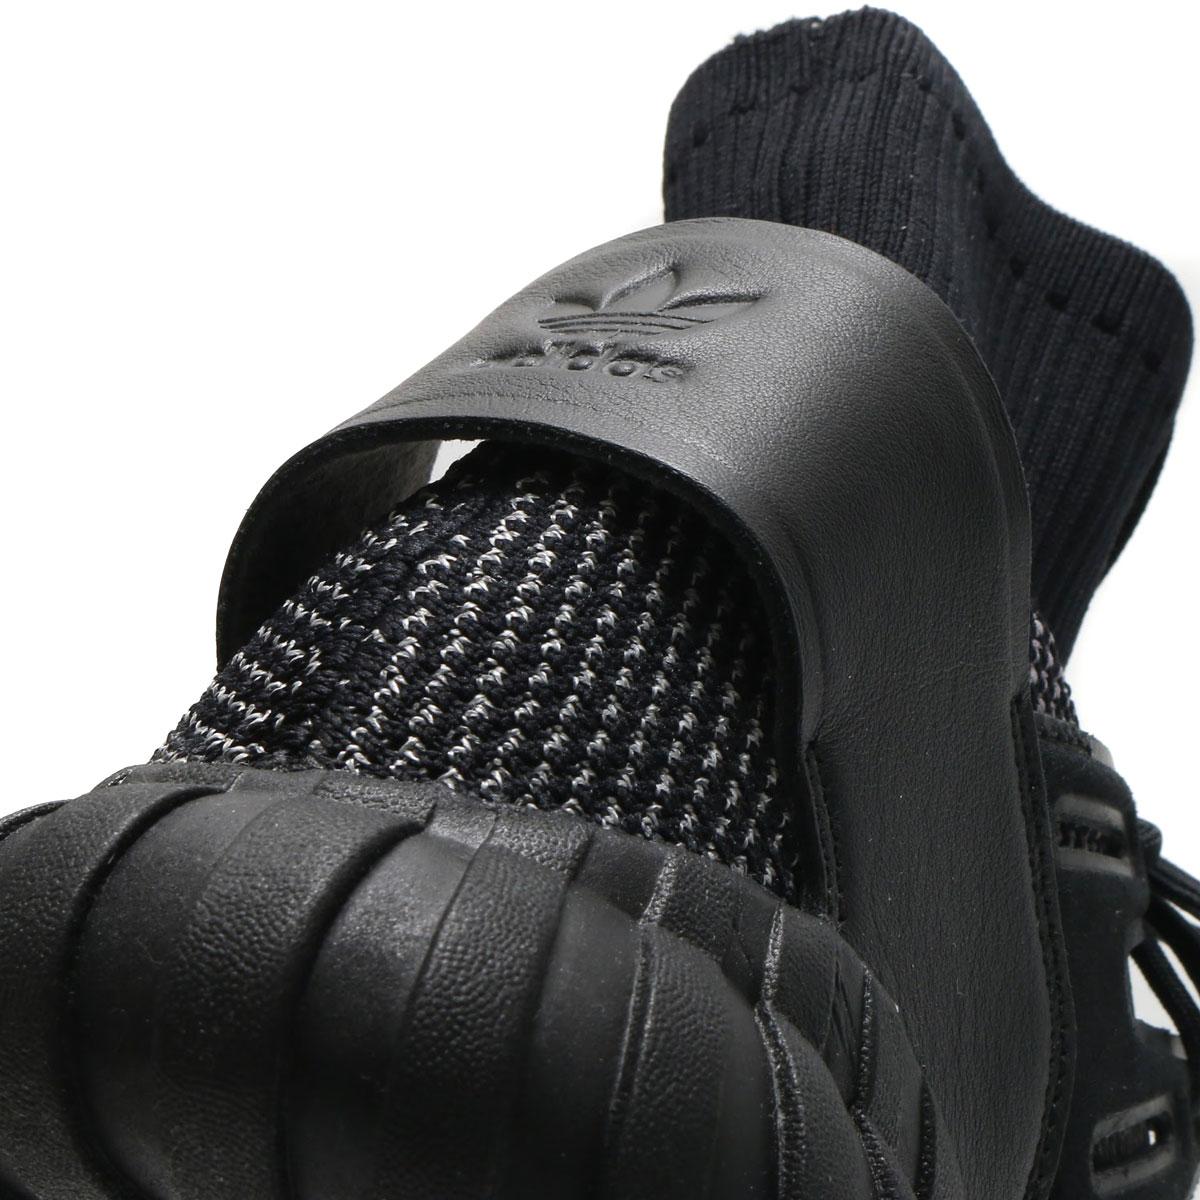 outlet store 9c836 1ef29 adidas Originals TUBULAR DOOM PK (アディダス オリジナルス チュブラー ドーム PK)Core Black/Core  Black/Grey Four【メンズ スニーカー】17FW-I|atmos-tokyo